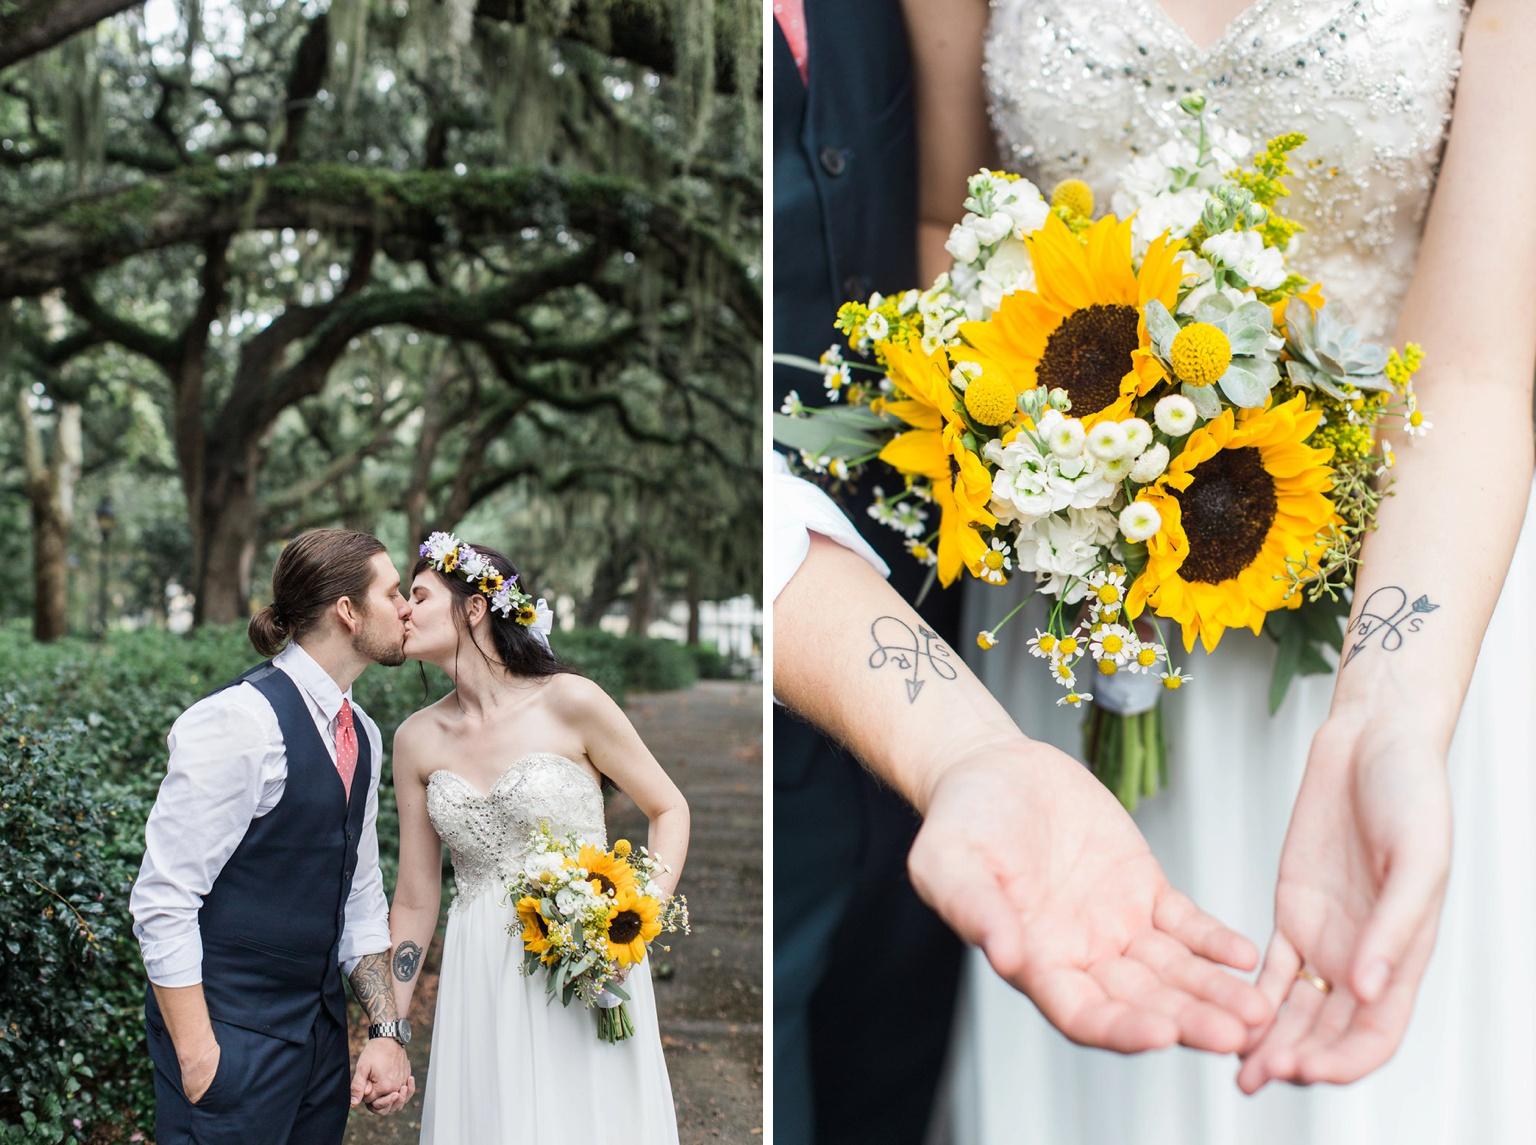 Apt_B_Photo_Savannah_Wedding_Photographer_Flower_Crown061.JPG